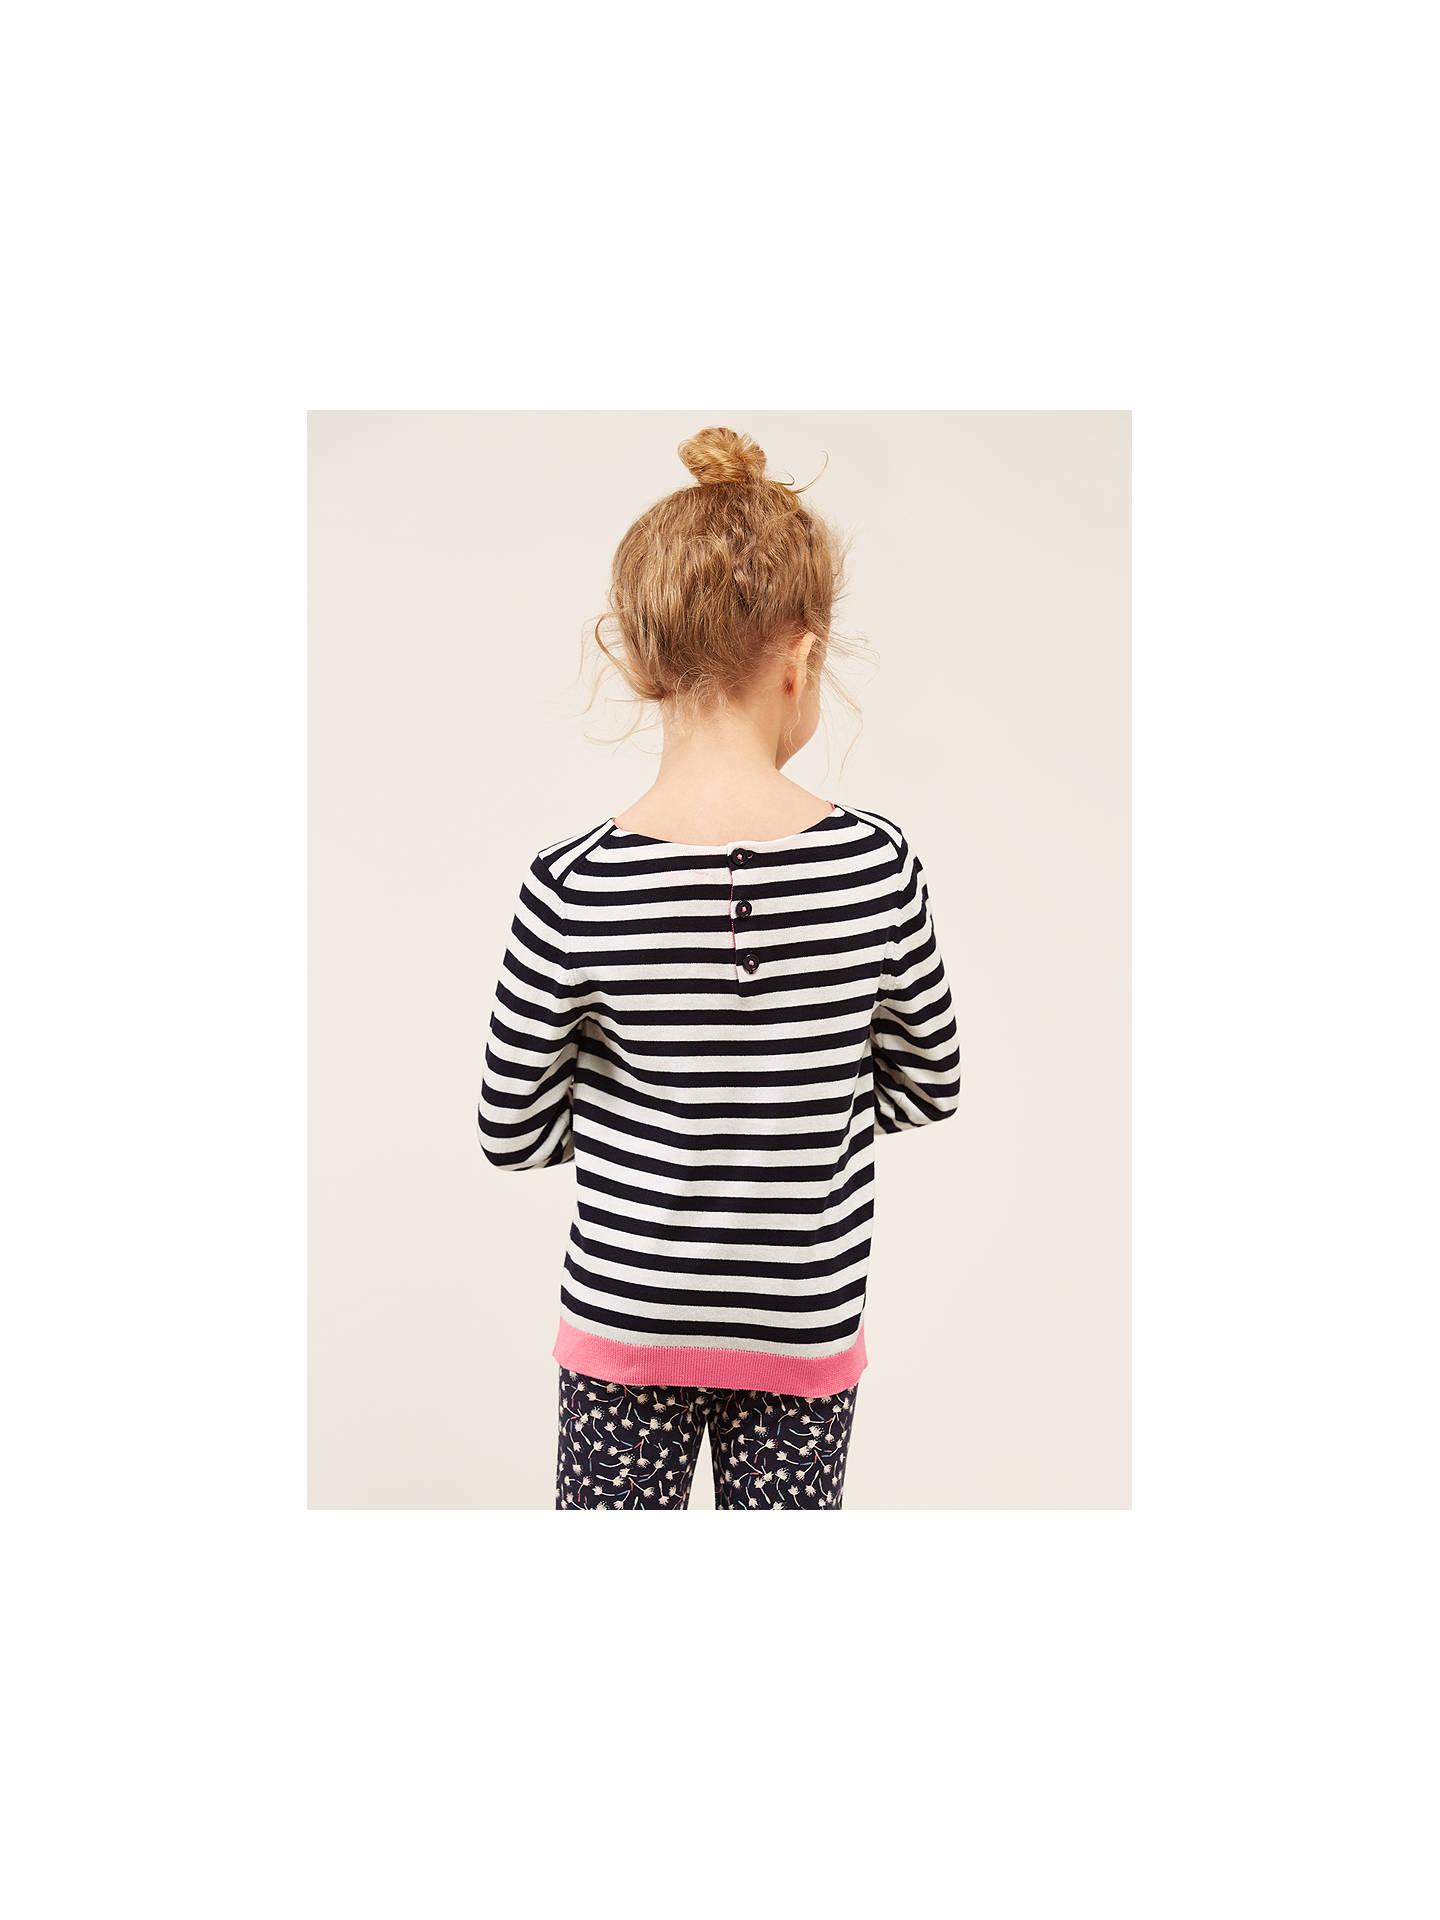 John Lewis Girls Pink Jumper Age 3,5 /& 6 Brand New RRP £13